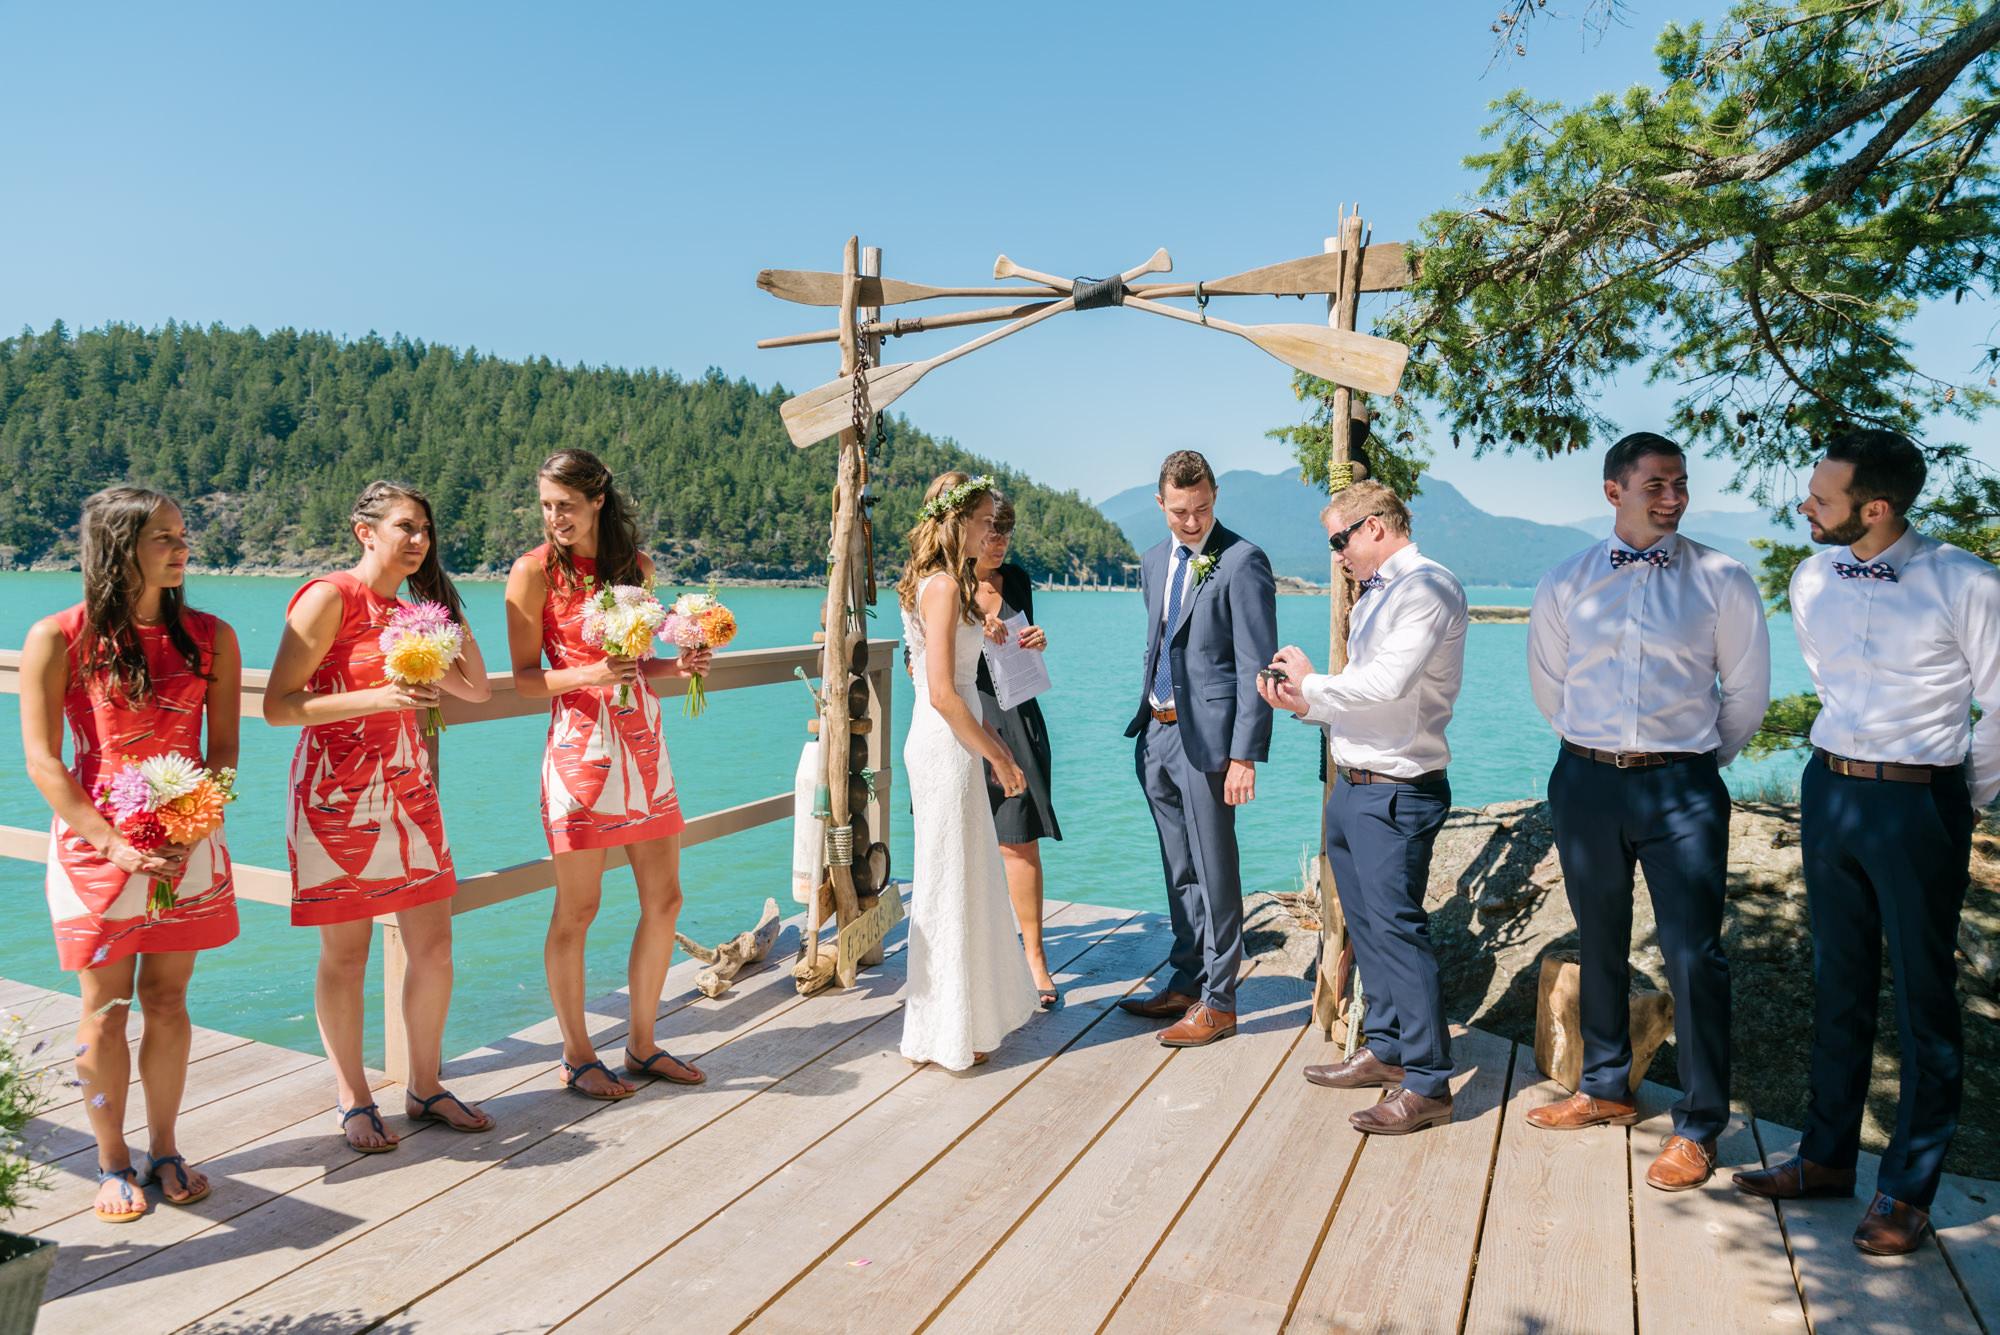 bowen_island_wedding_photographer_vancouver142657_16_ally&james.jpg